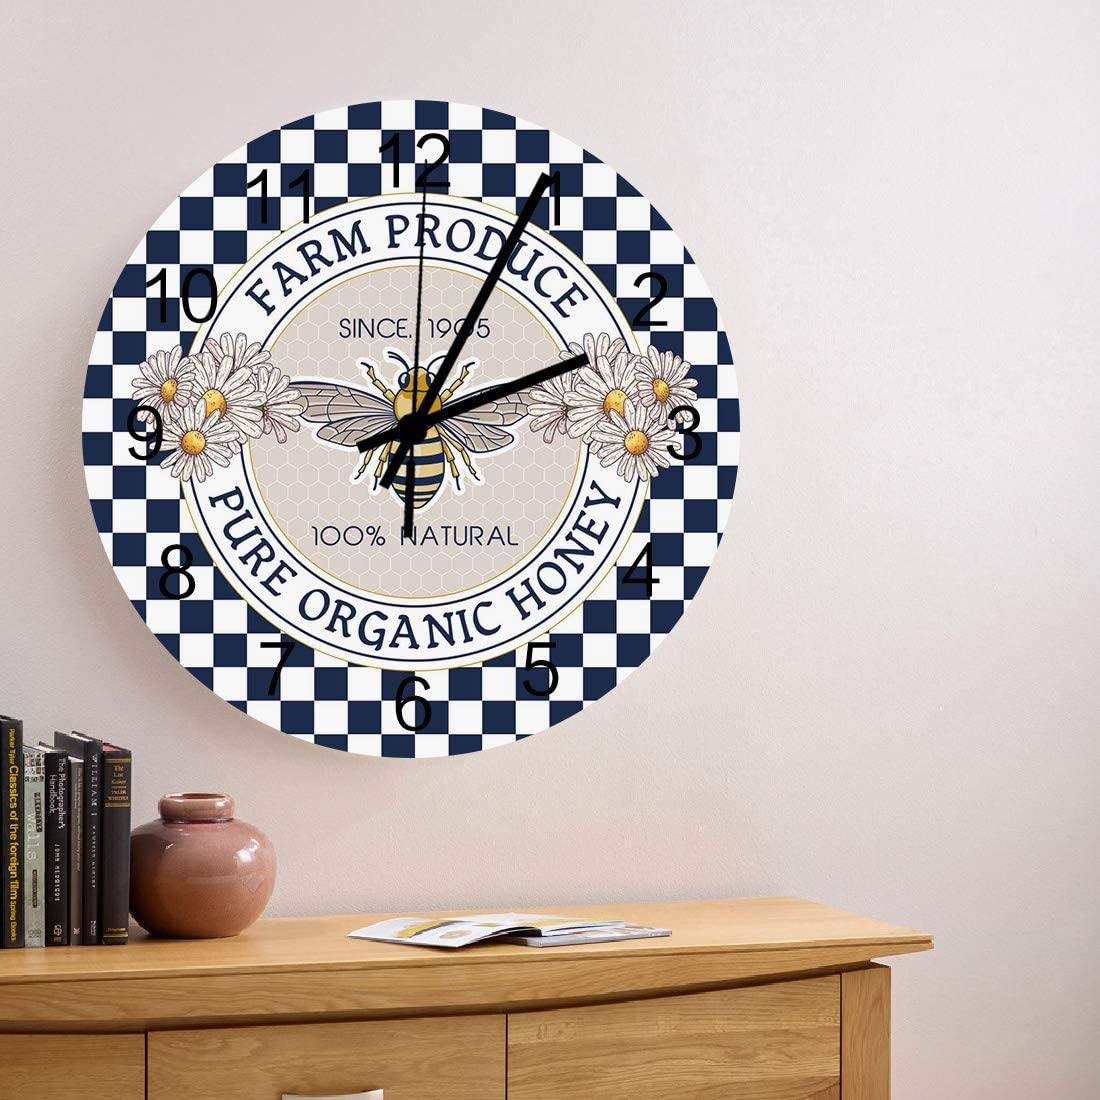 Virginia Beach Mall MuswannaA 5 popular 12 Inch Silent Non-Ticking Clock Wooden Wall Round Whi